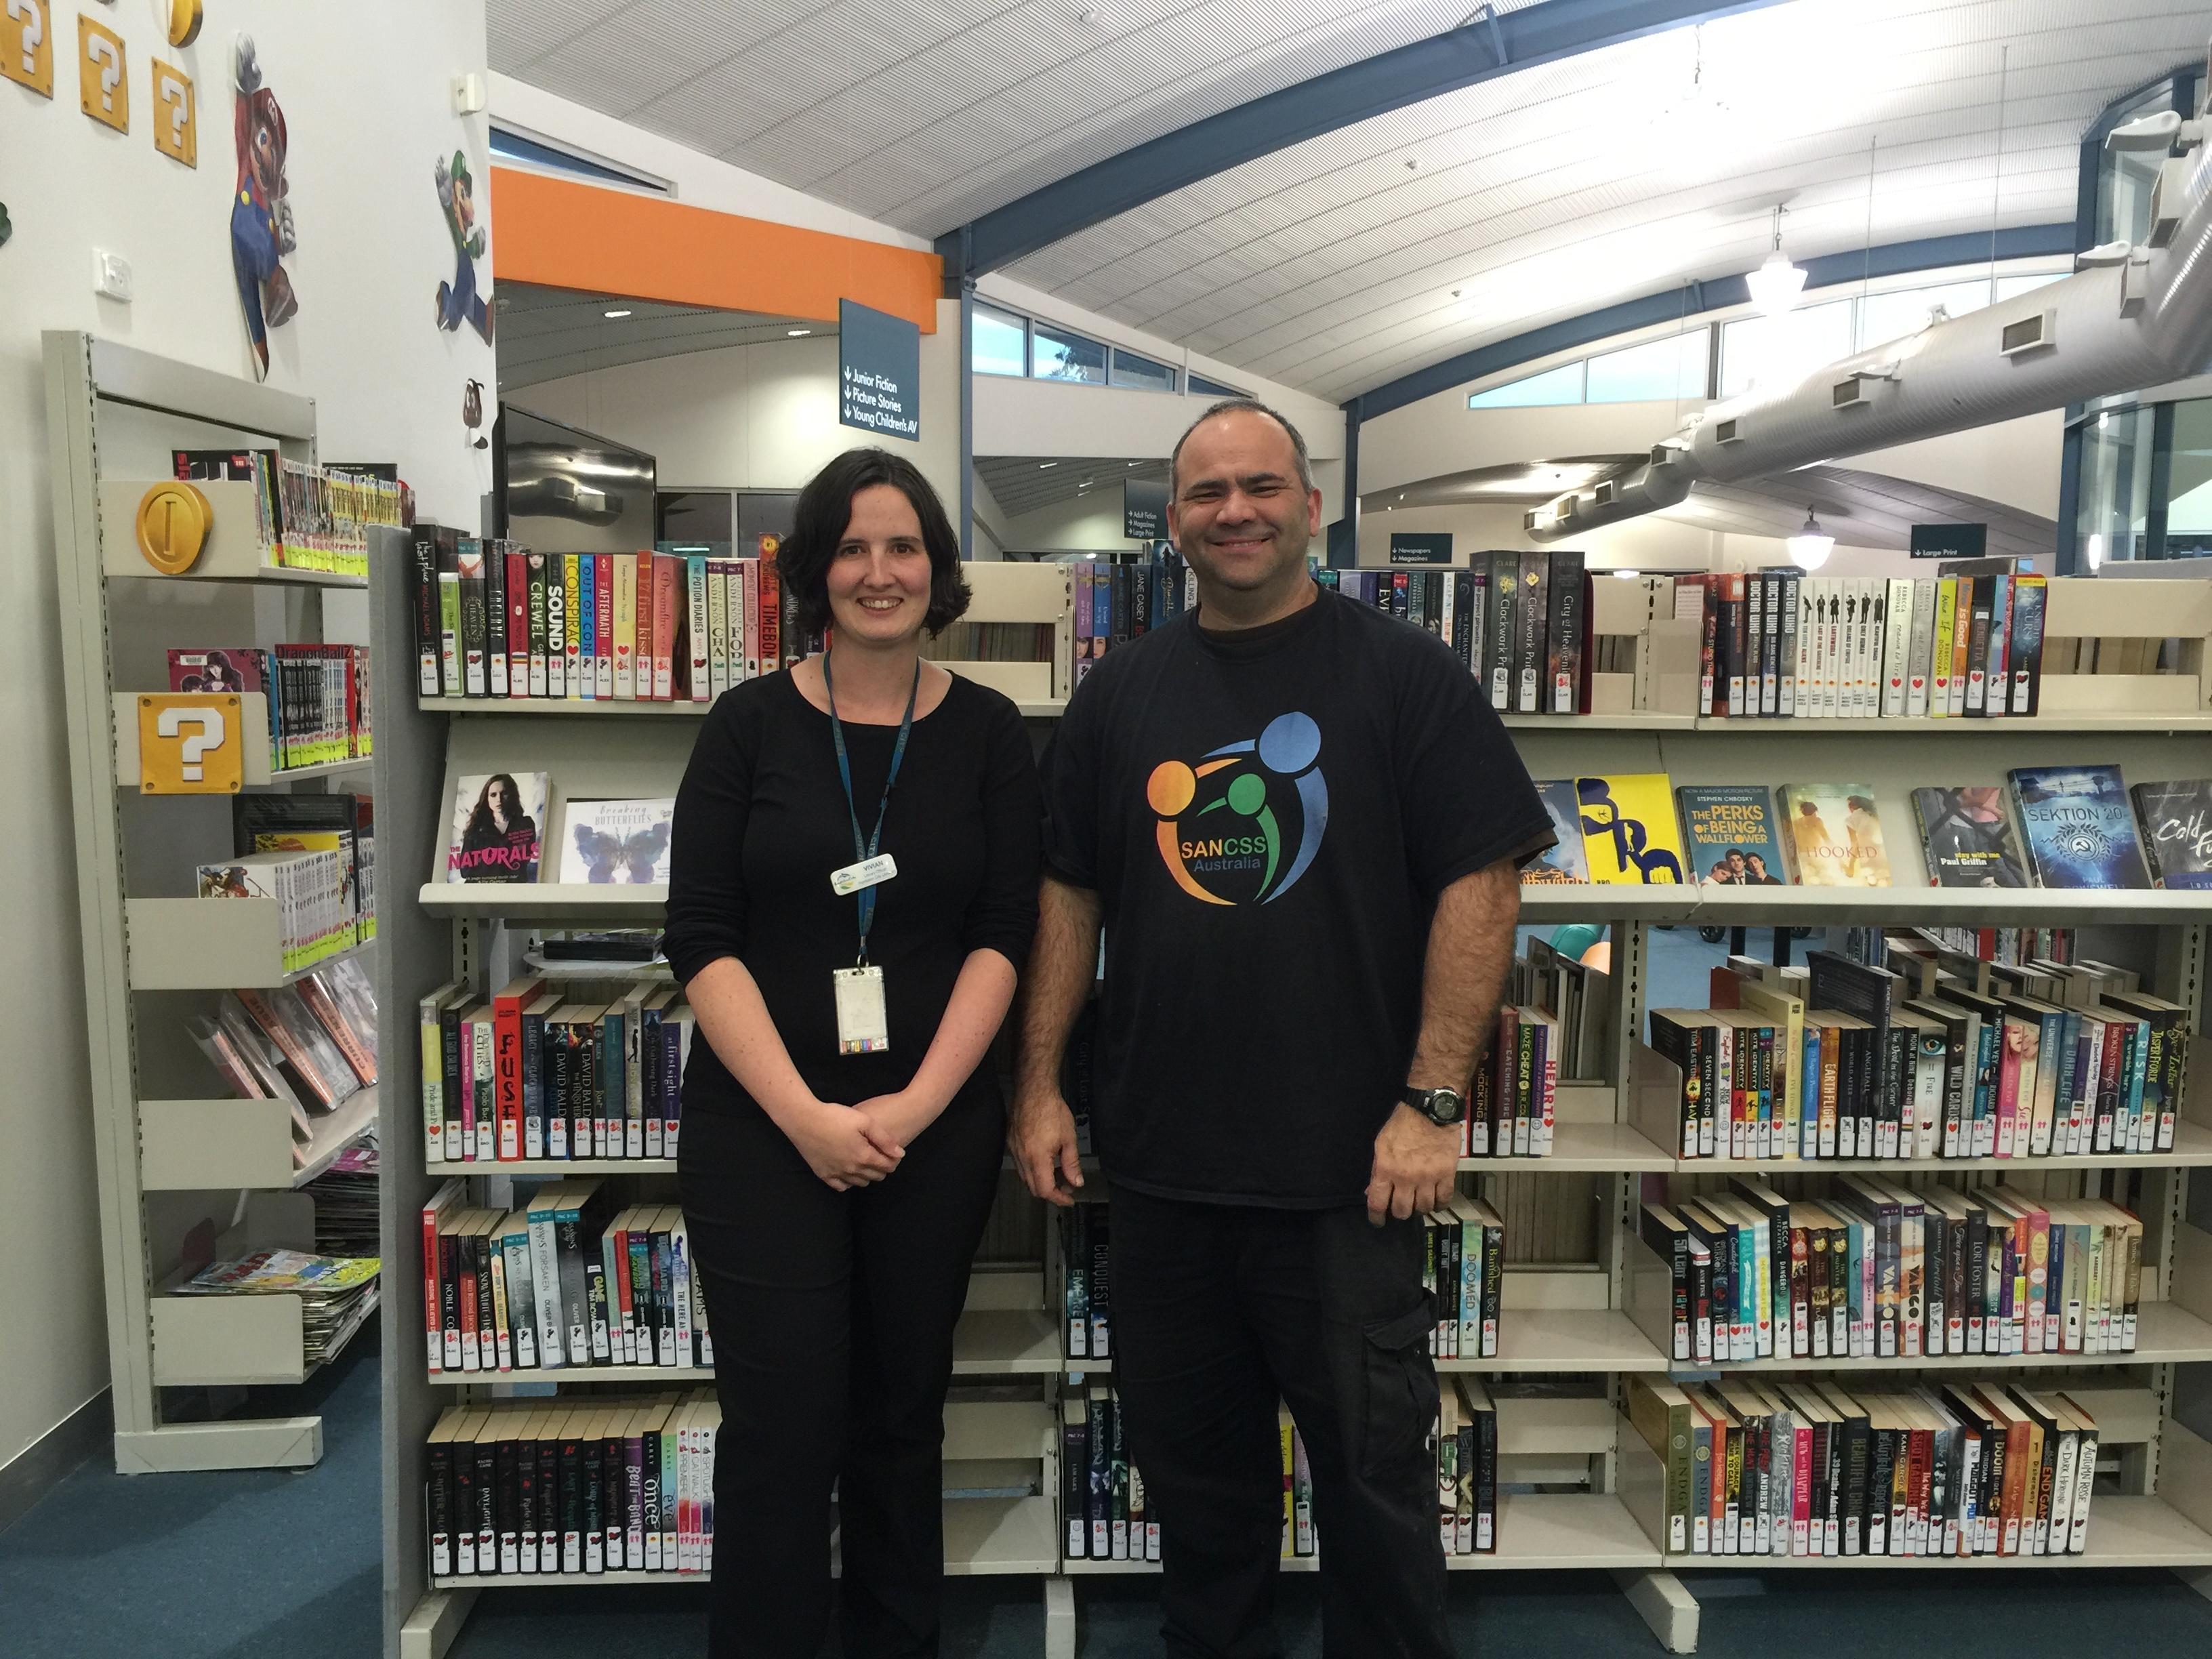 book-donation-sancss-may2016